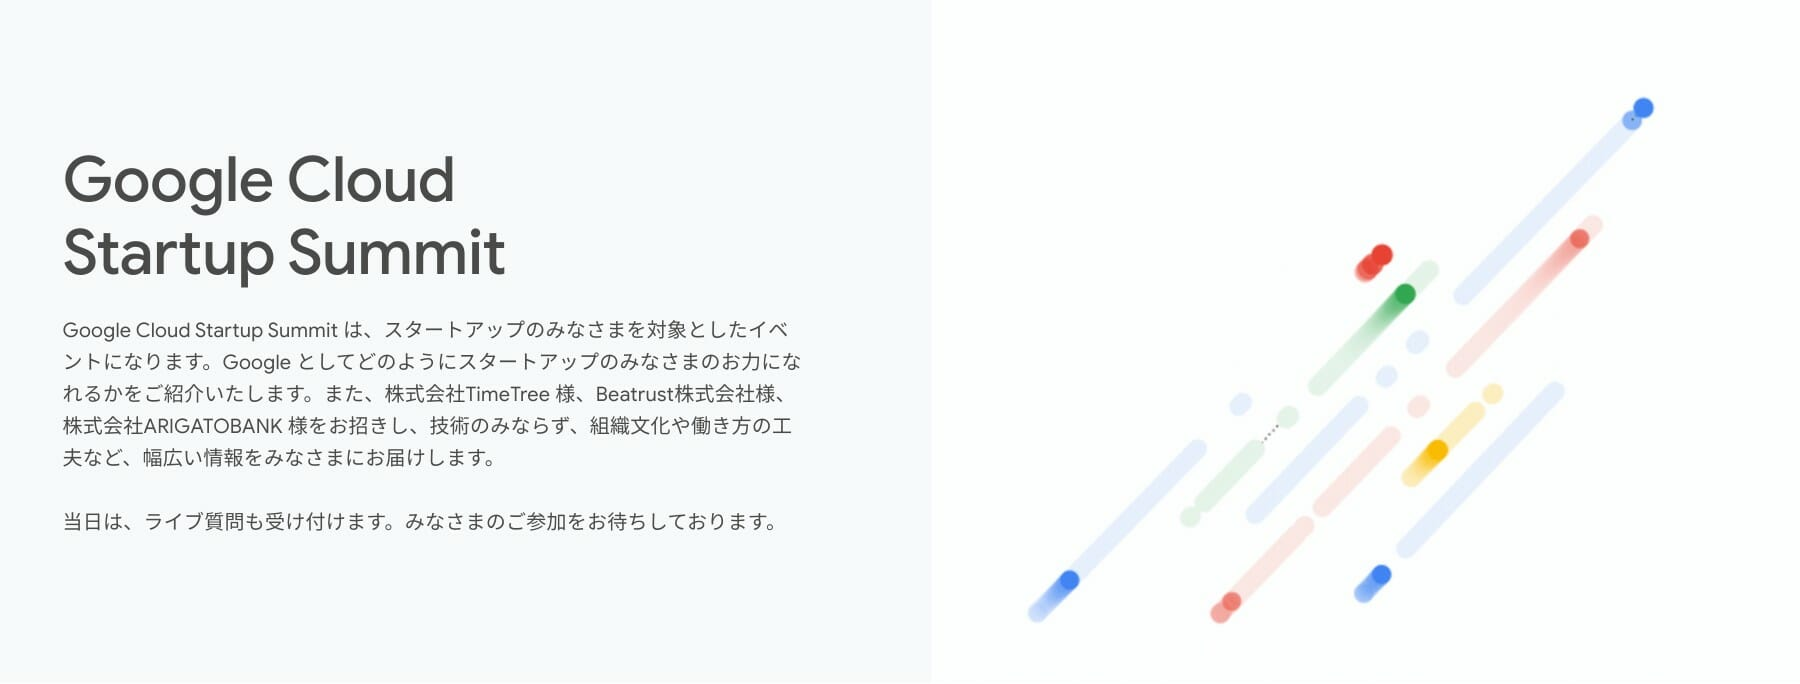 [GCP] Google Cloud Startup Summit